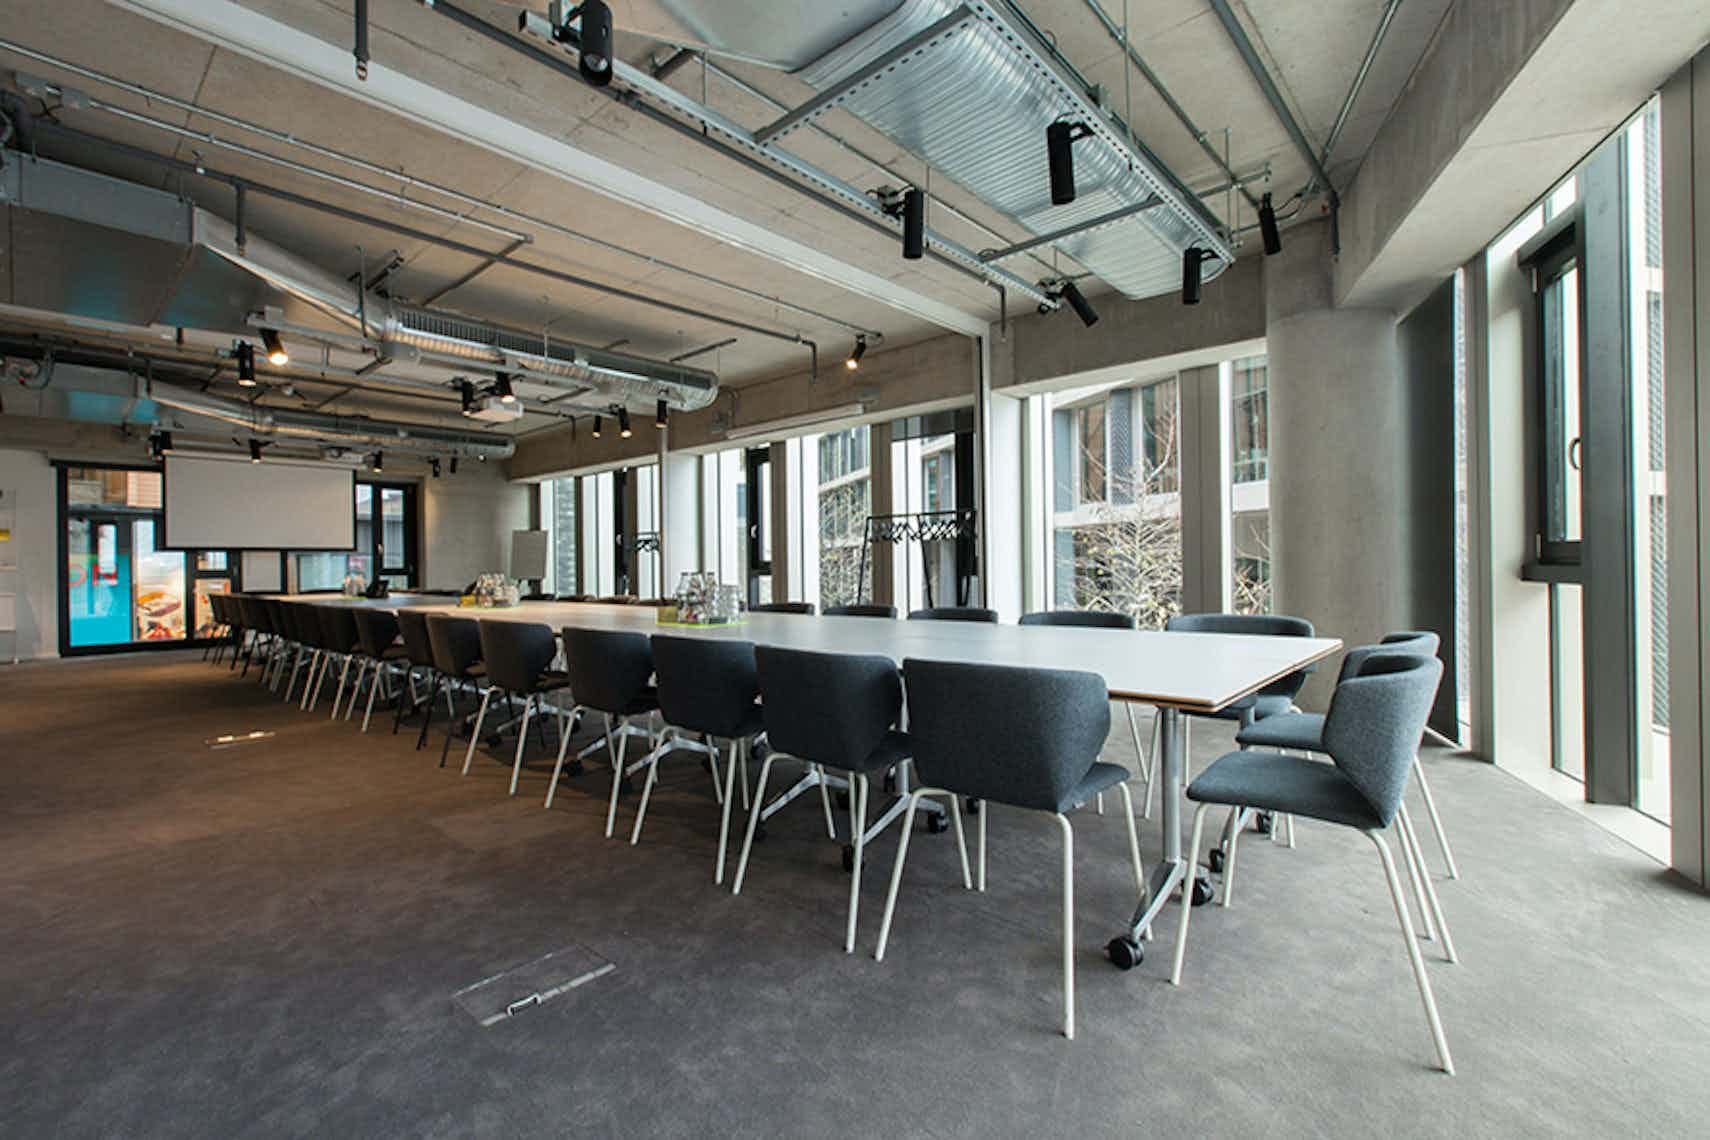 Meeting Rooms 6, 7 & 8, TOG, Stanley